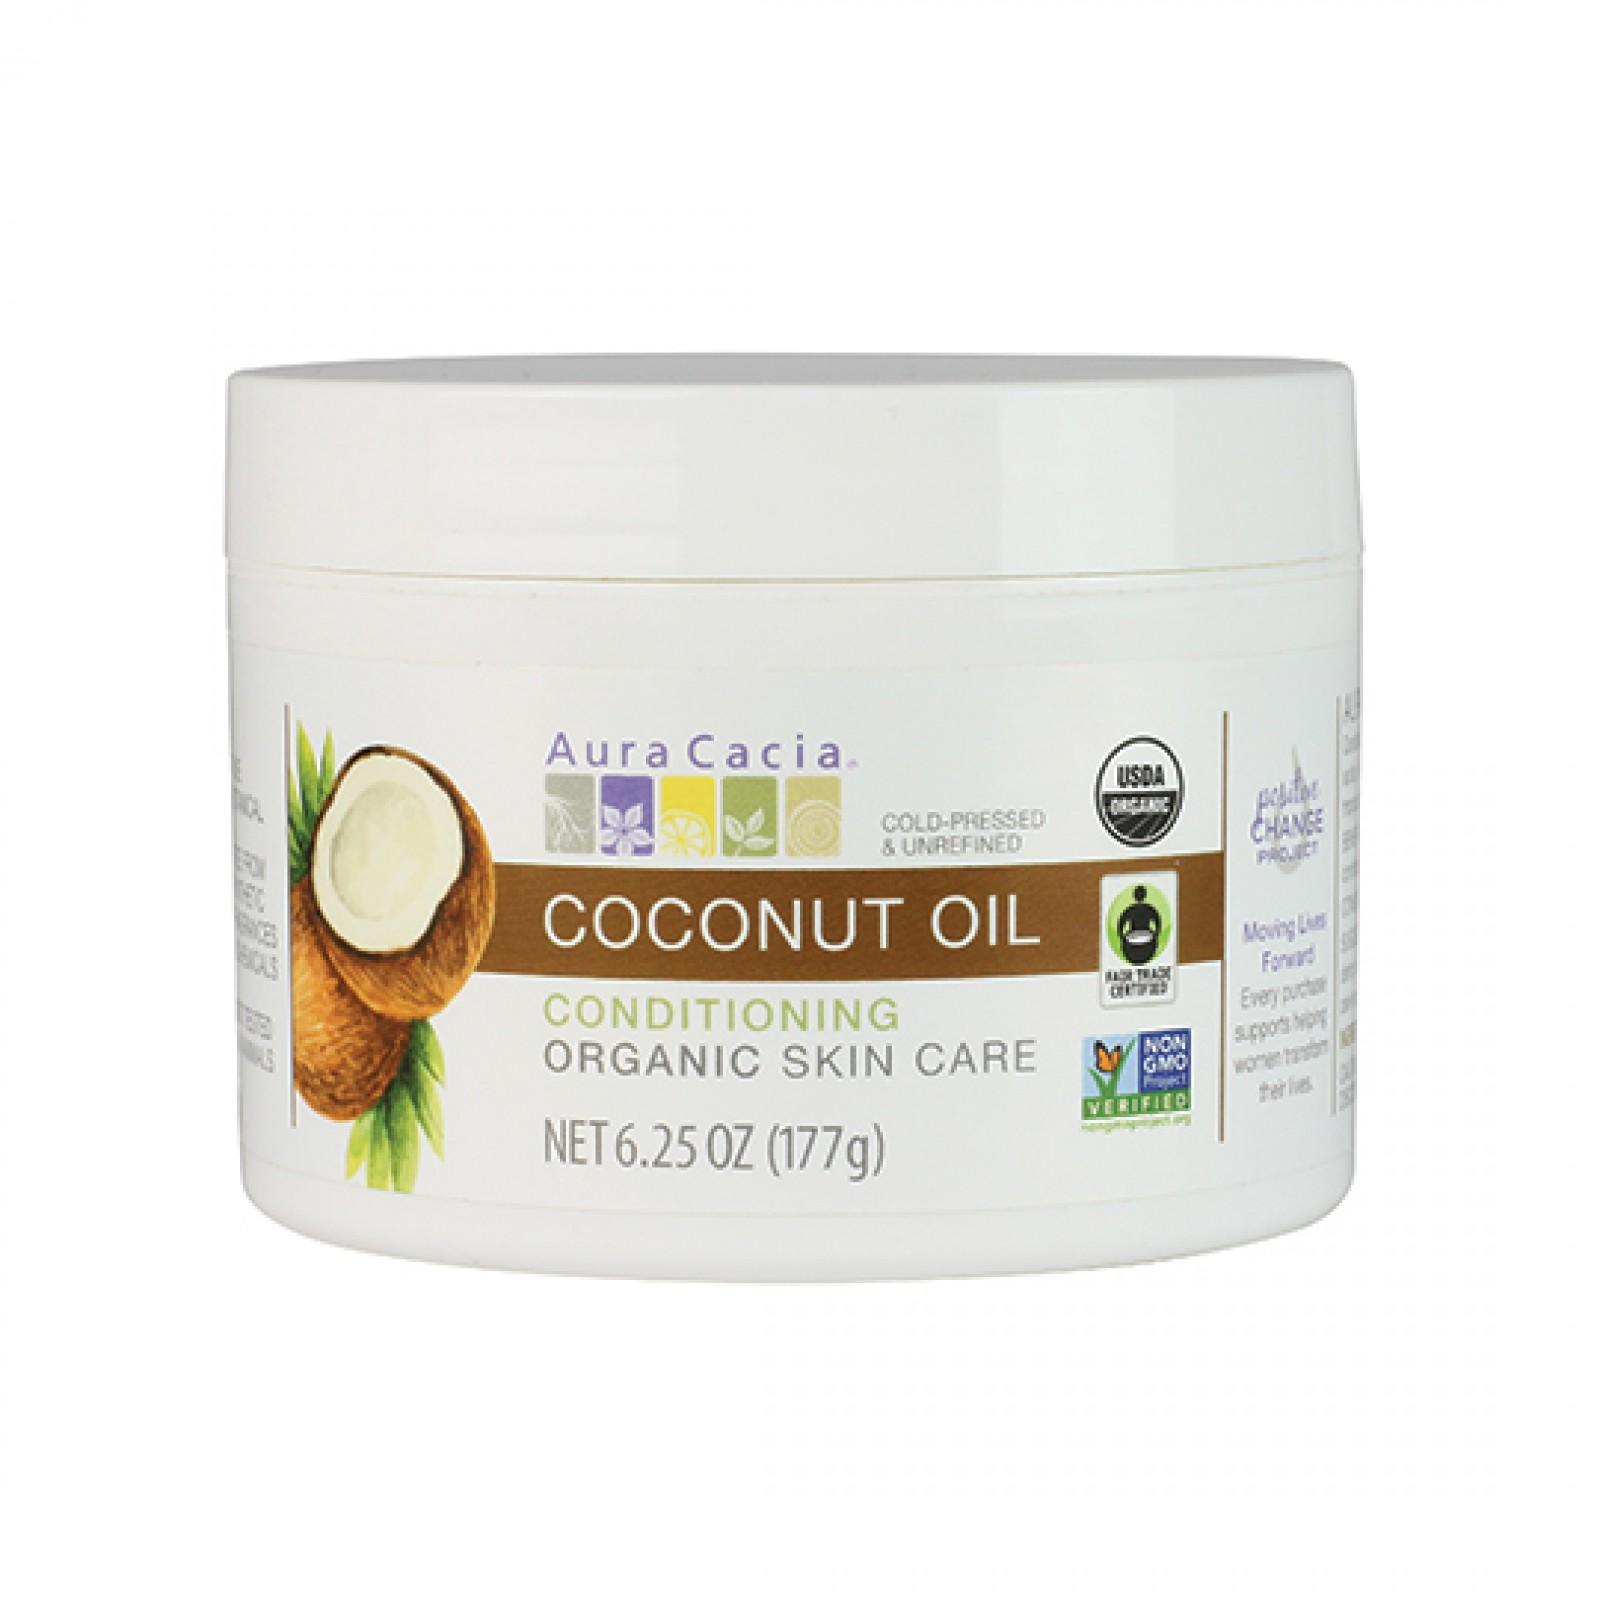 aura-cacia-coconut-oil-190140-front_4